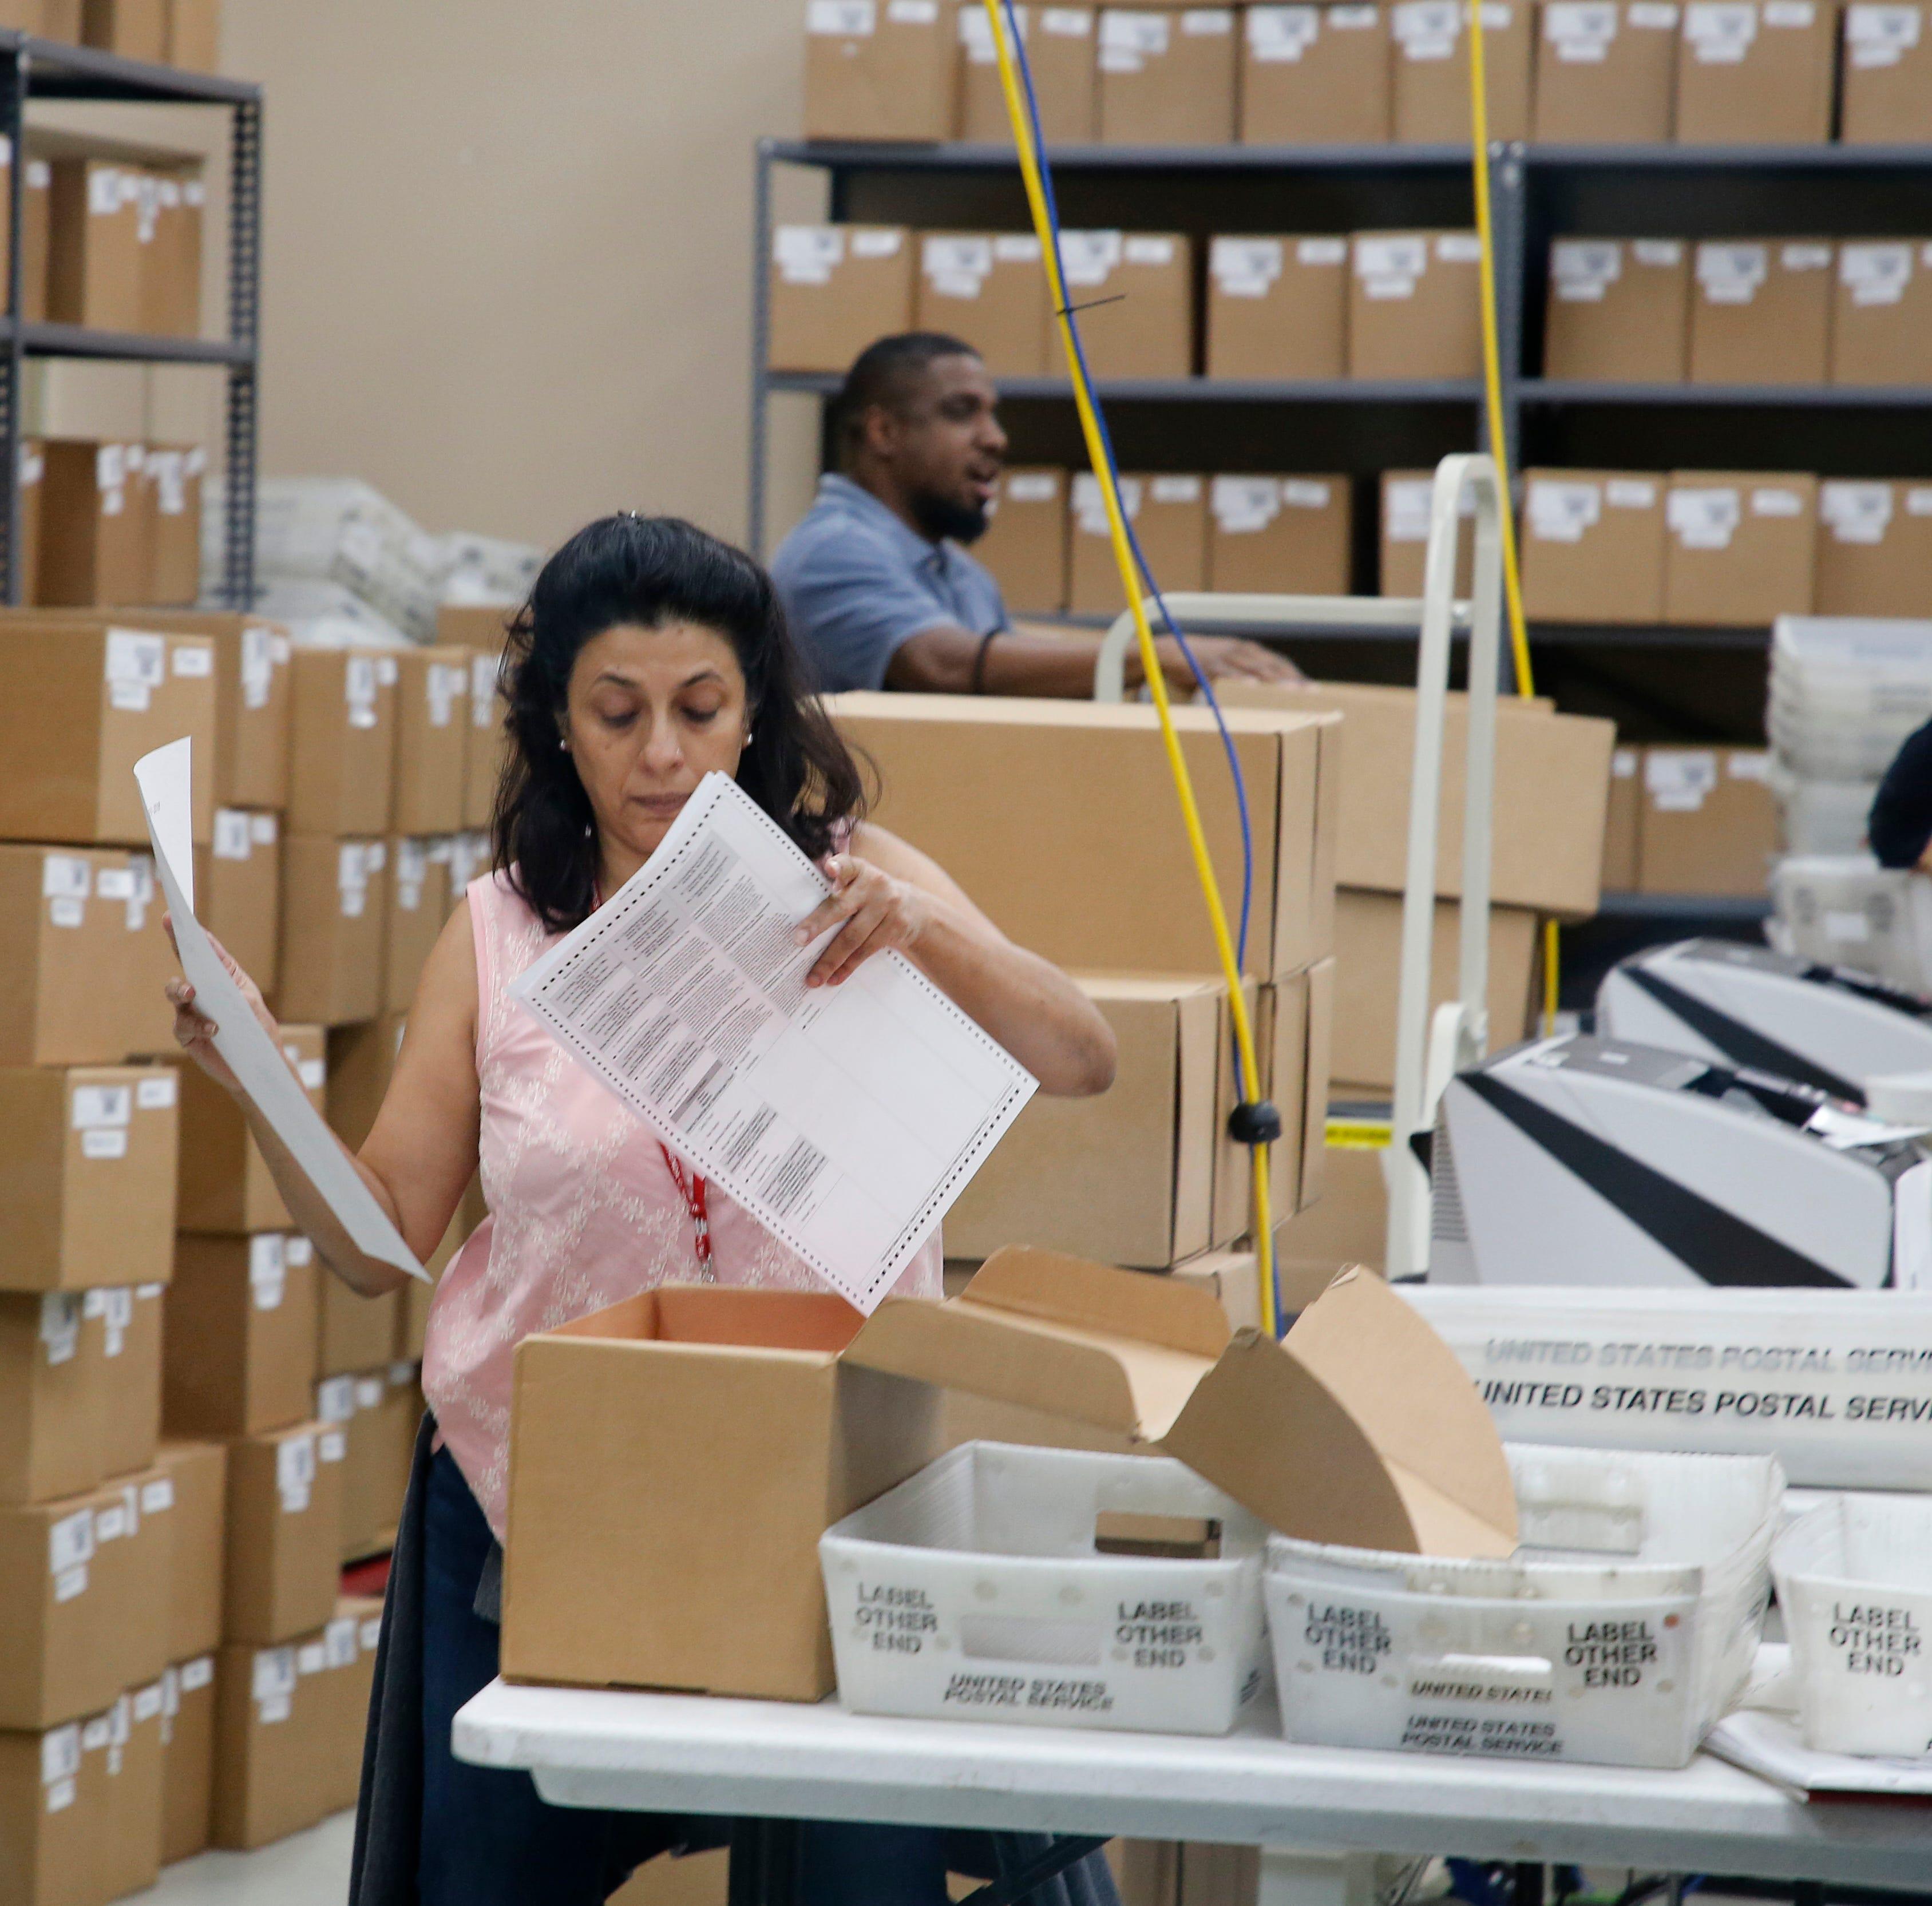 Senate recount: Broward undervotes likely to be key in deciding winner